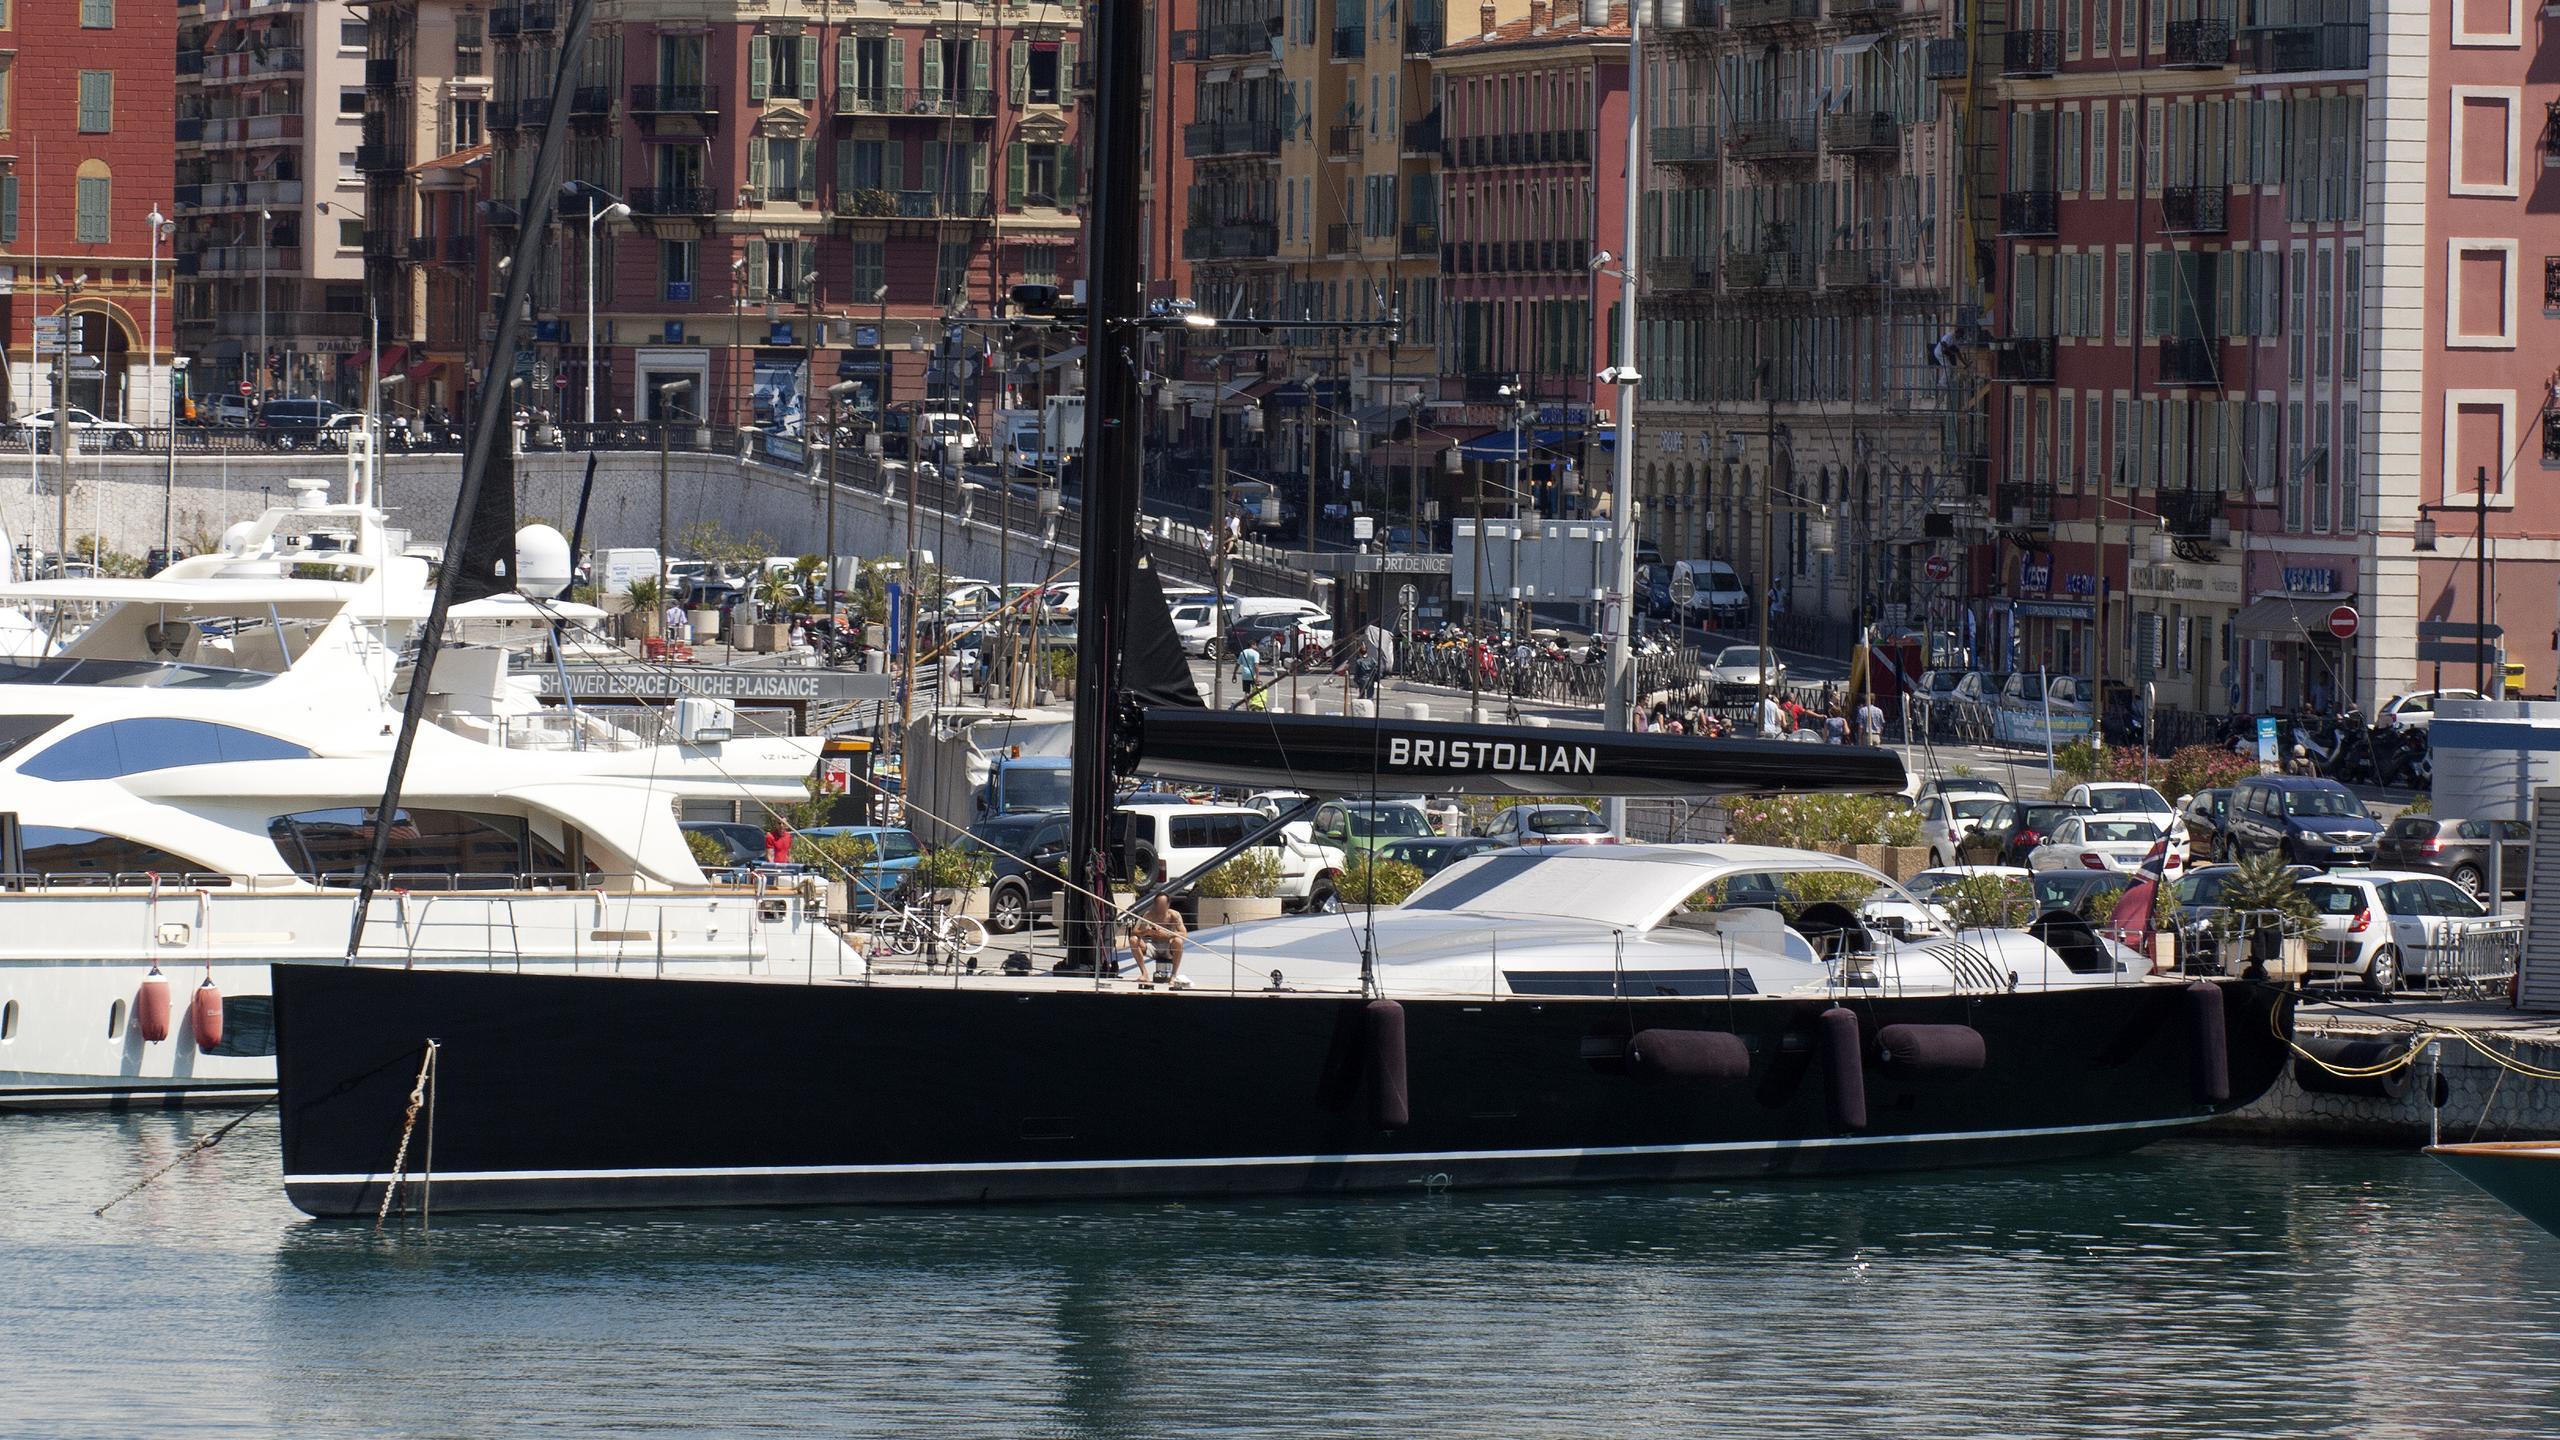 bristolian-yacht-exterior